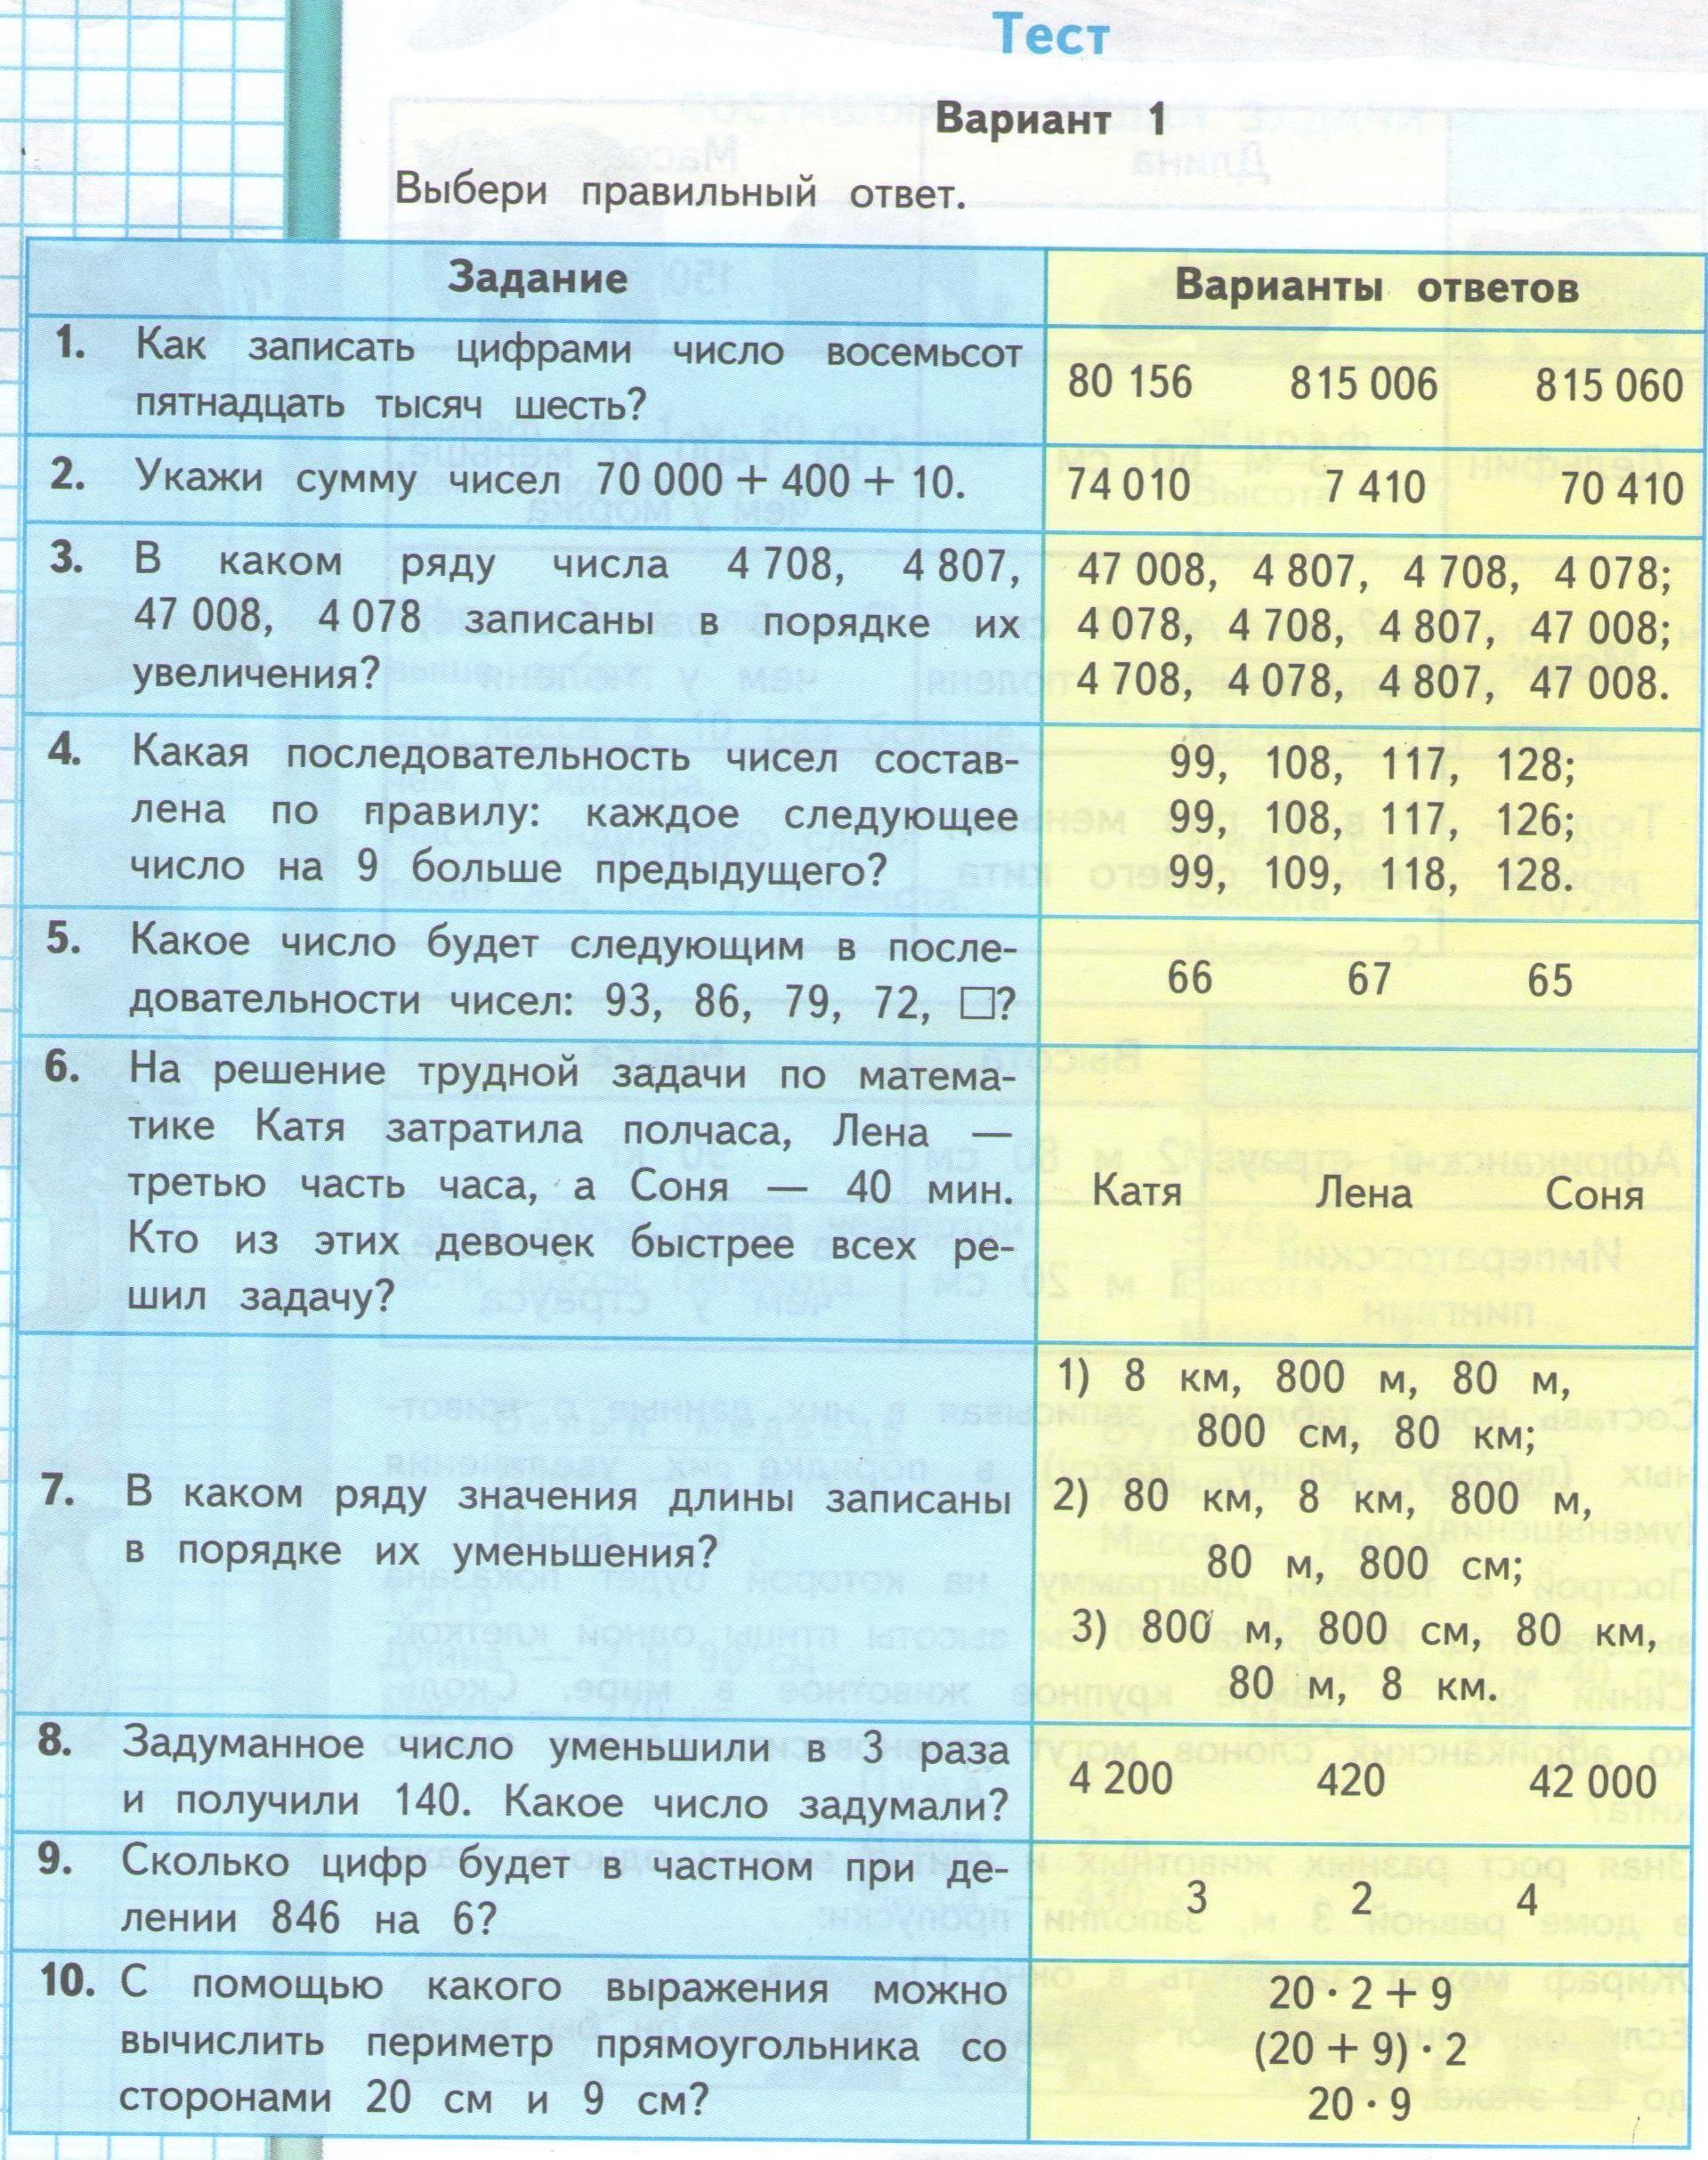 тесты по истории азербайджана